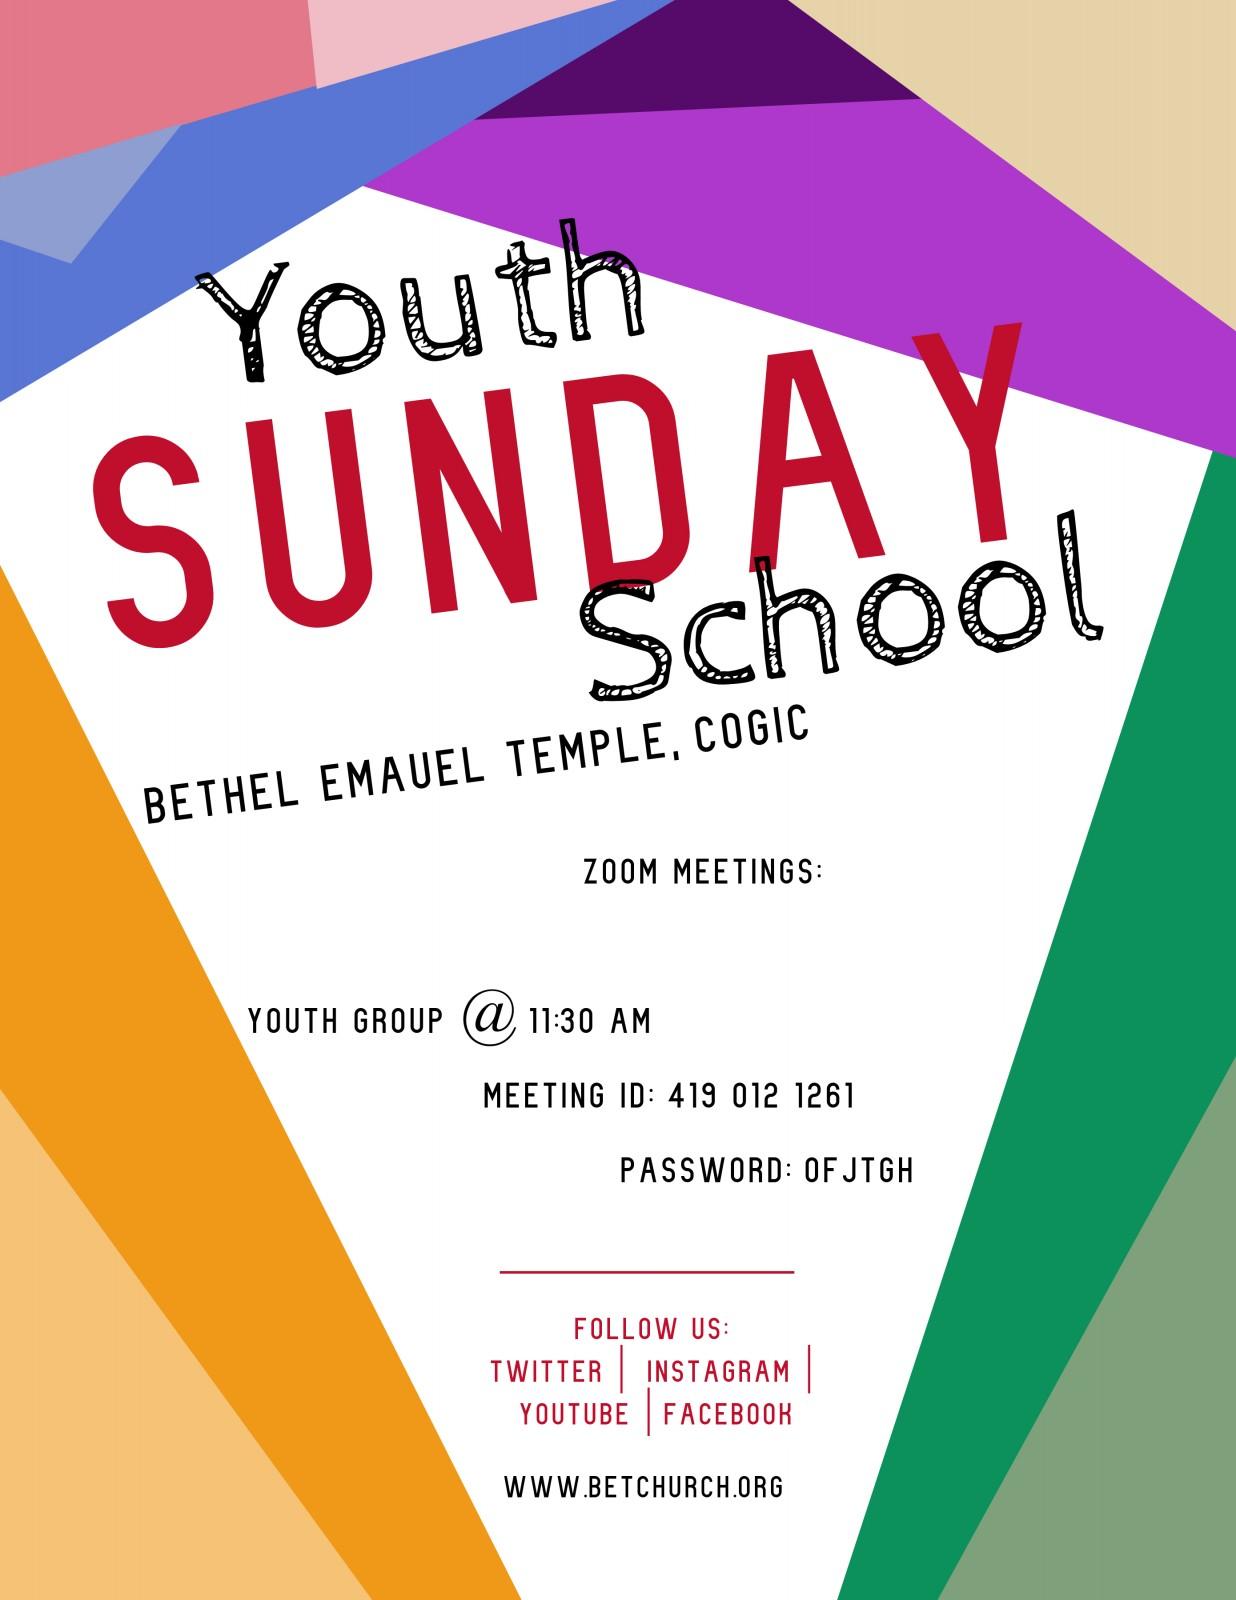 Sunday school (1)